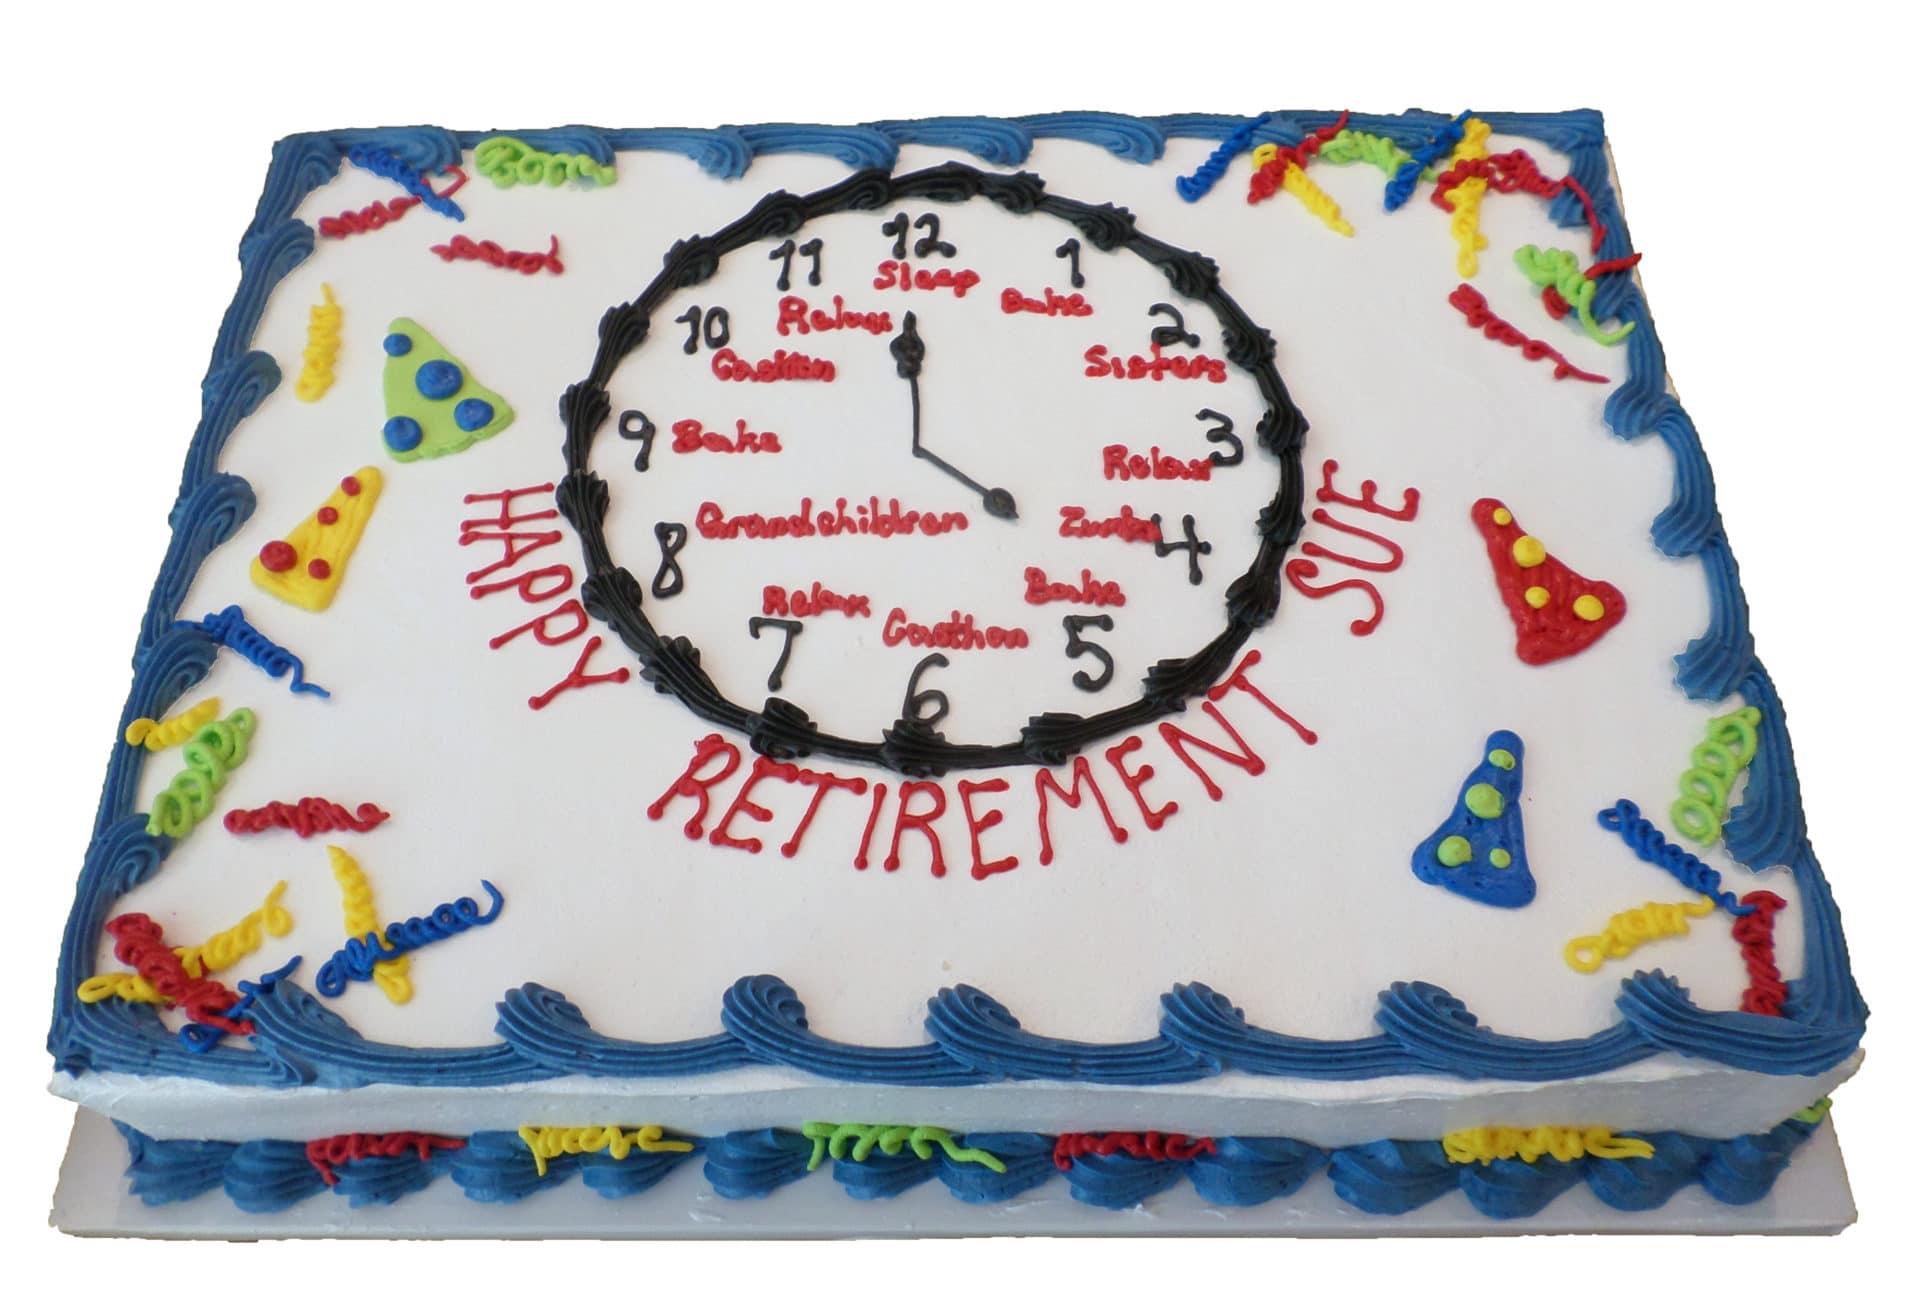 Retirement Cake 3 Aggie S Bakery Cake Shop